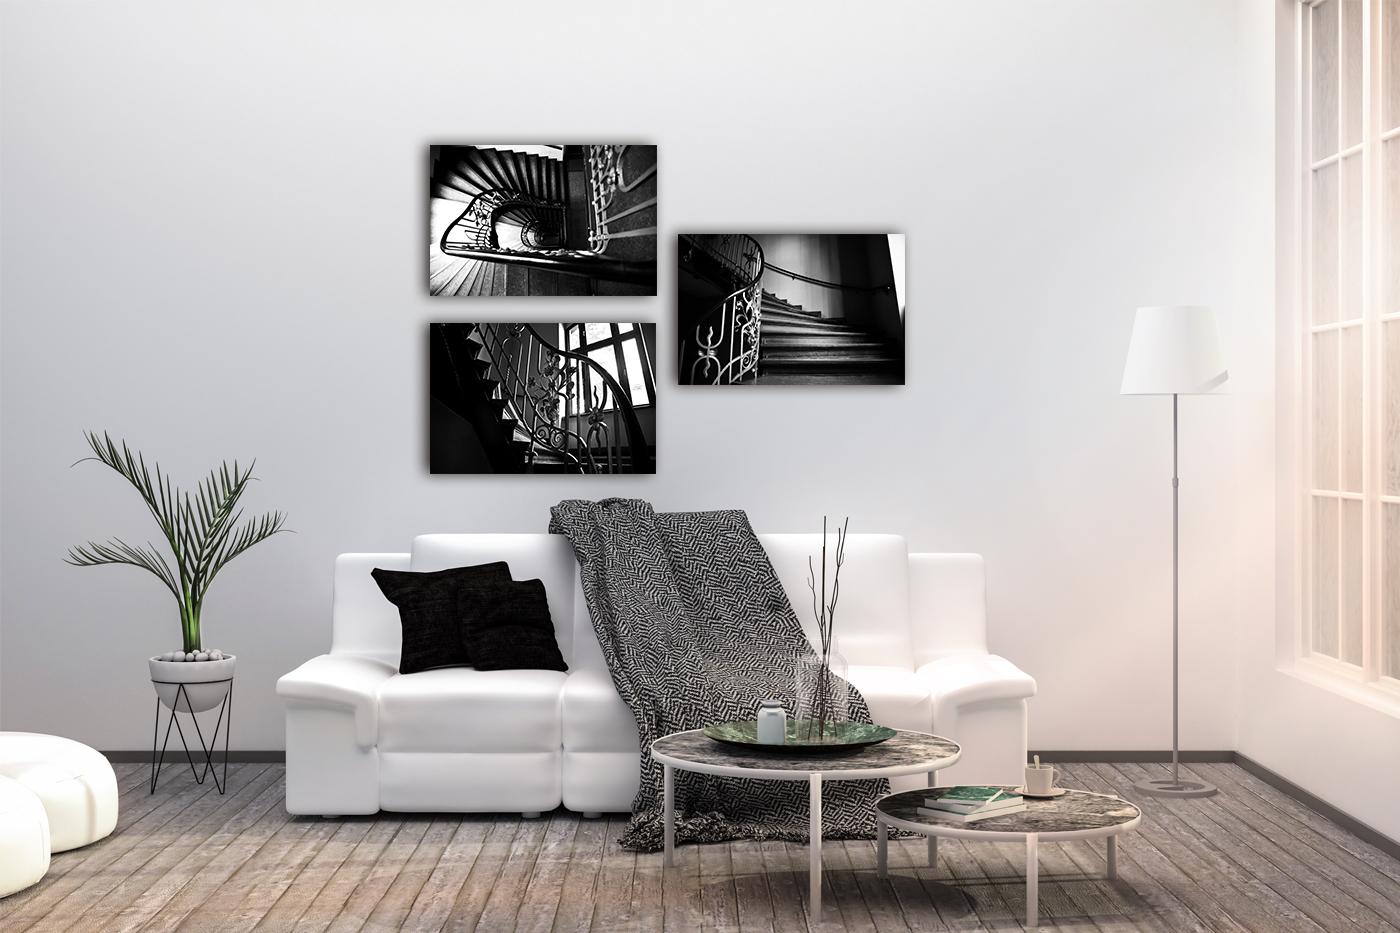 Stairs photo, architecture photo, photo set example image 7